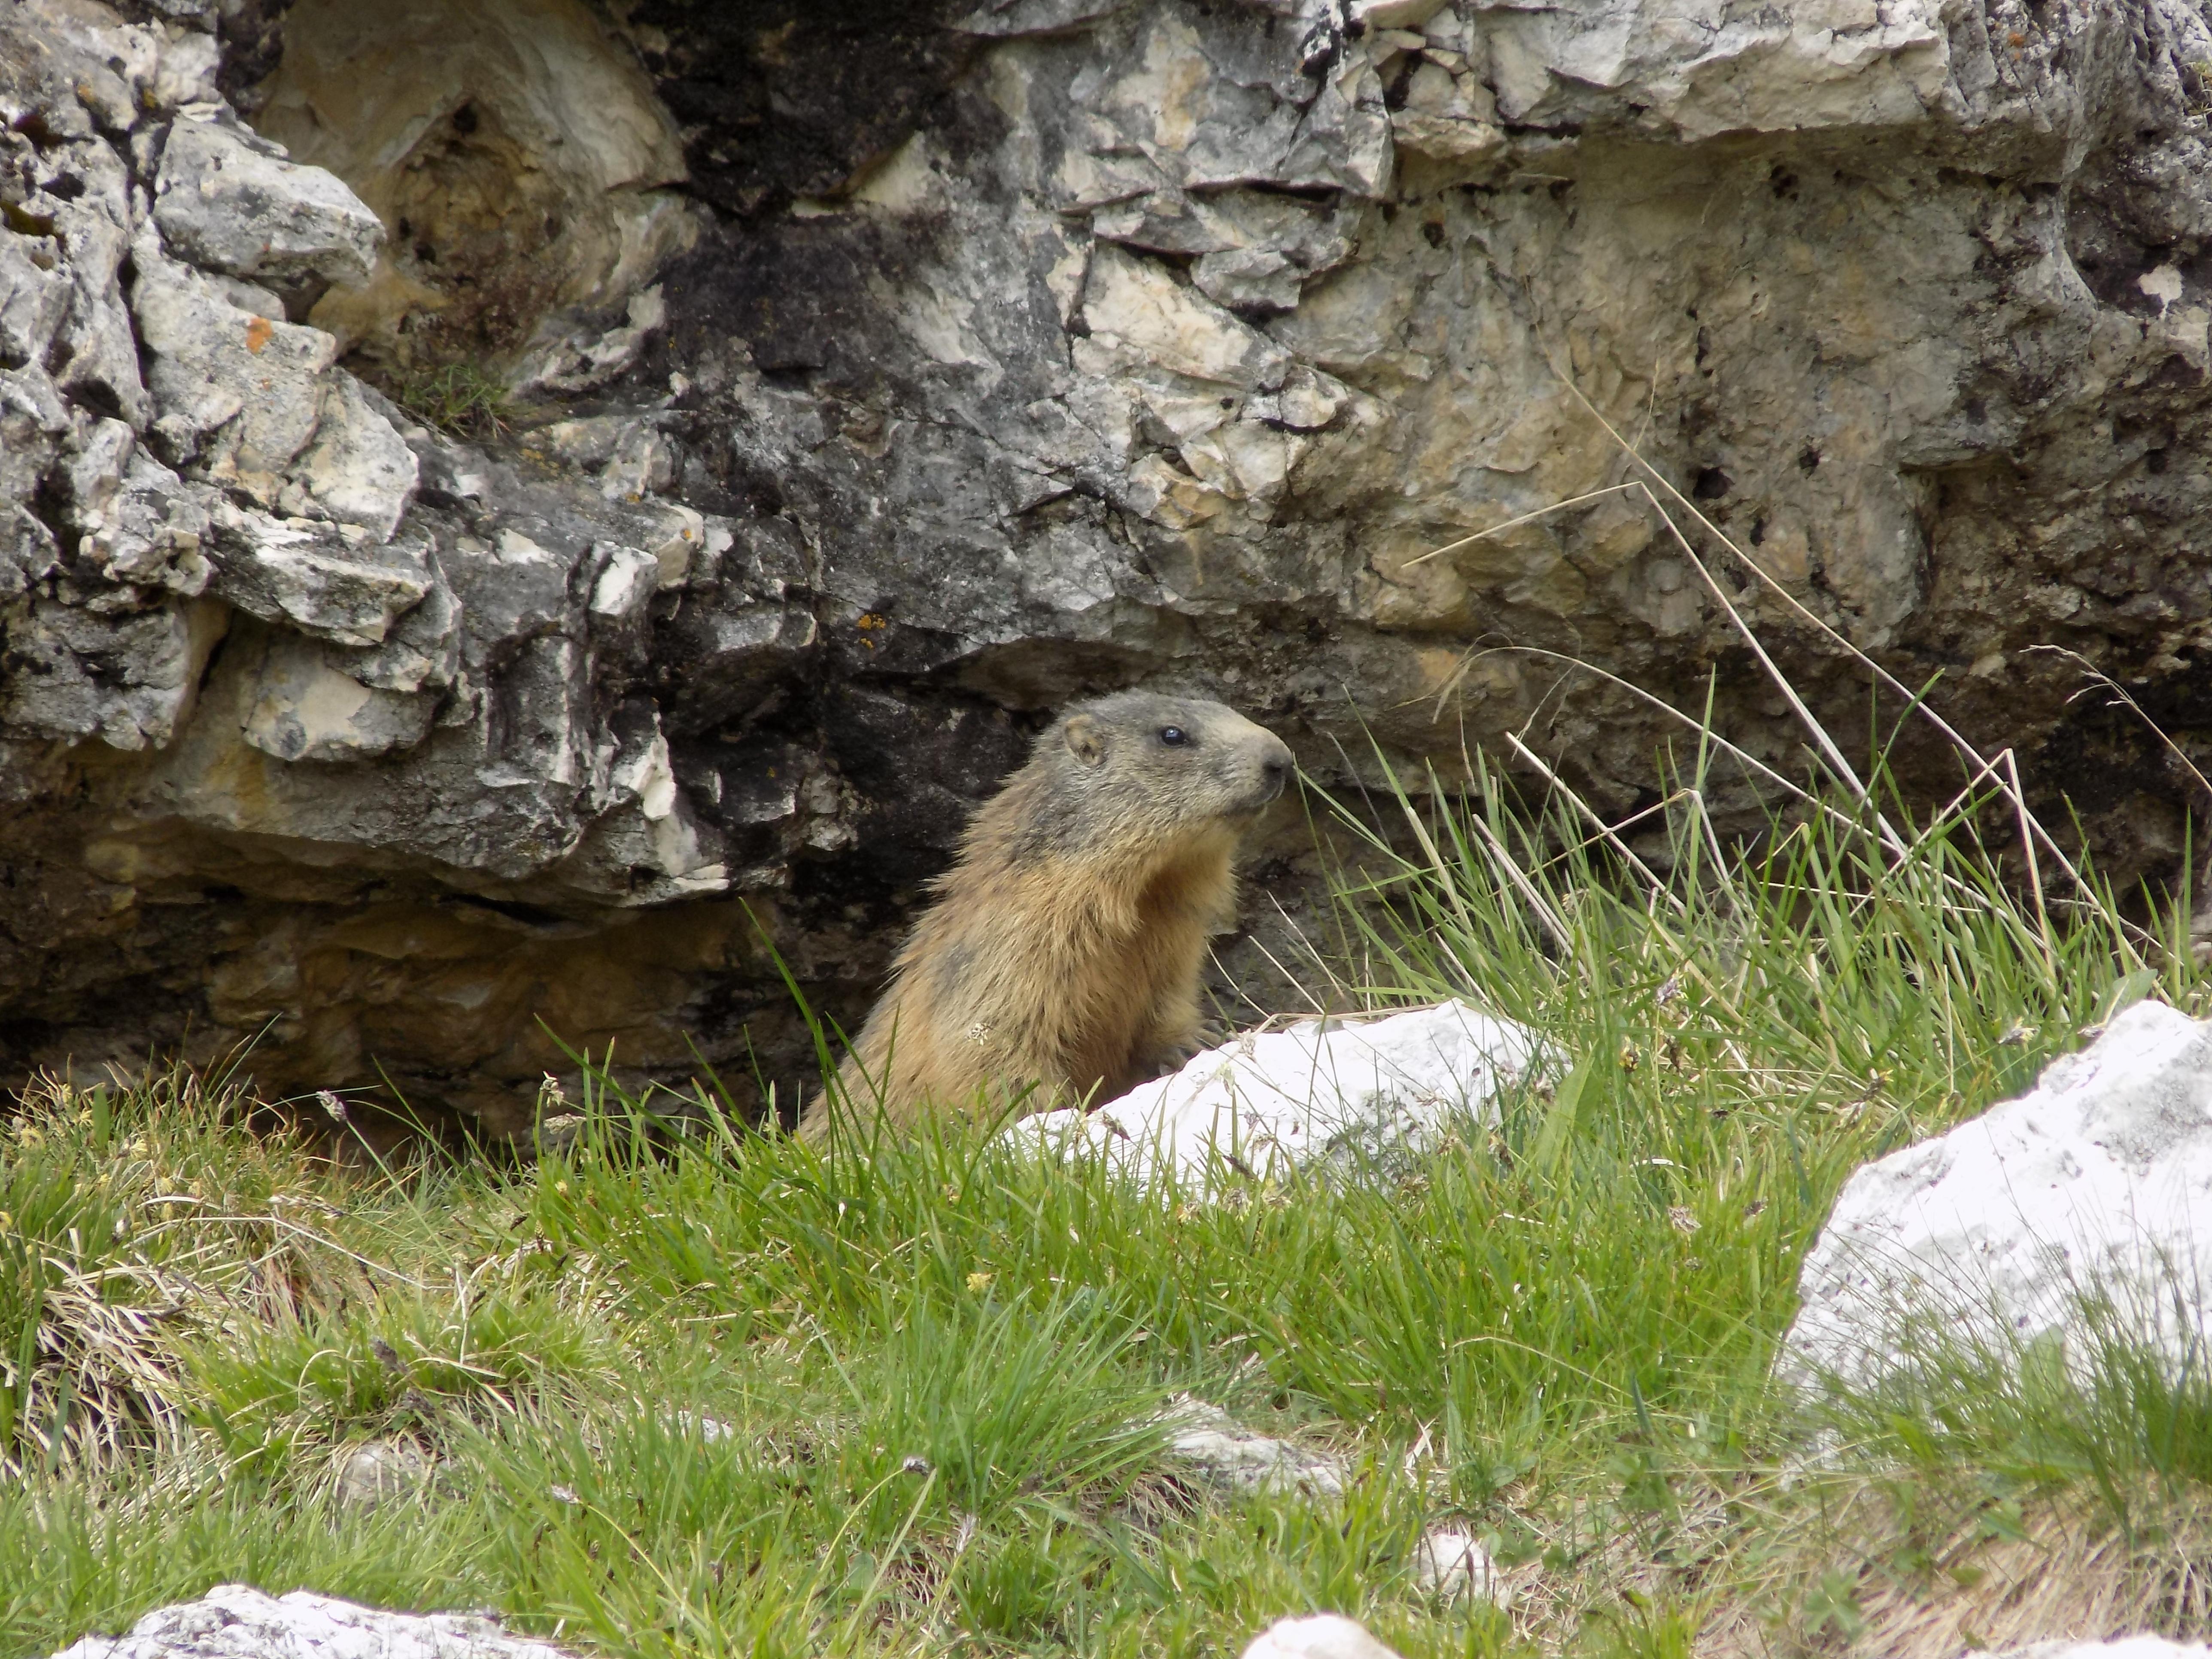 Marmot at the Sief Refugio